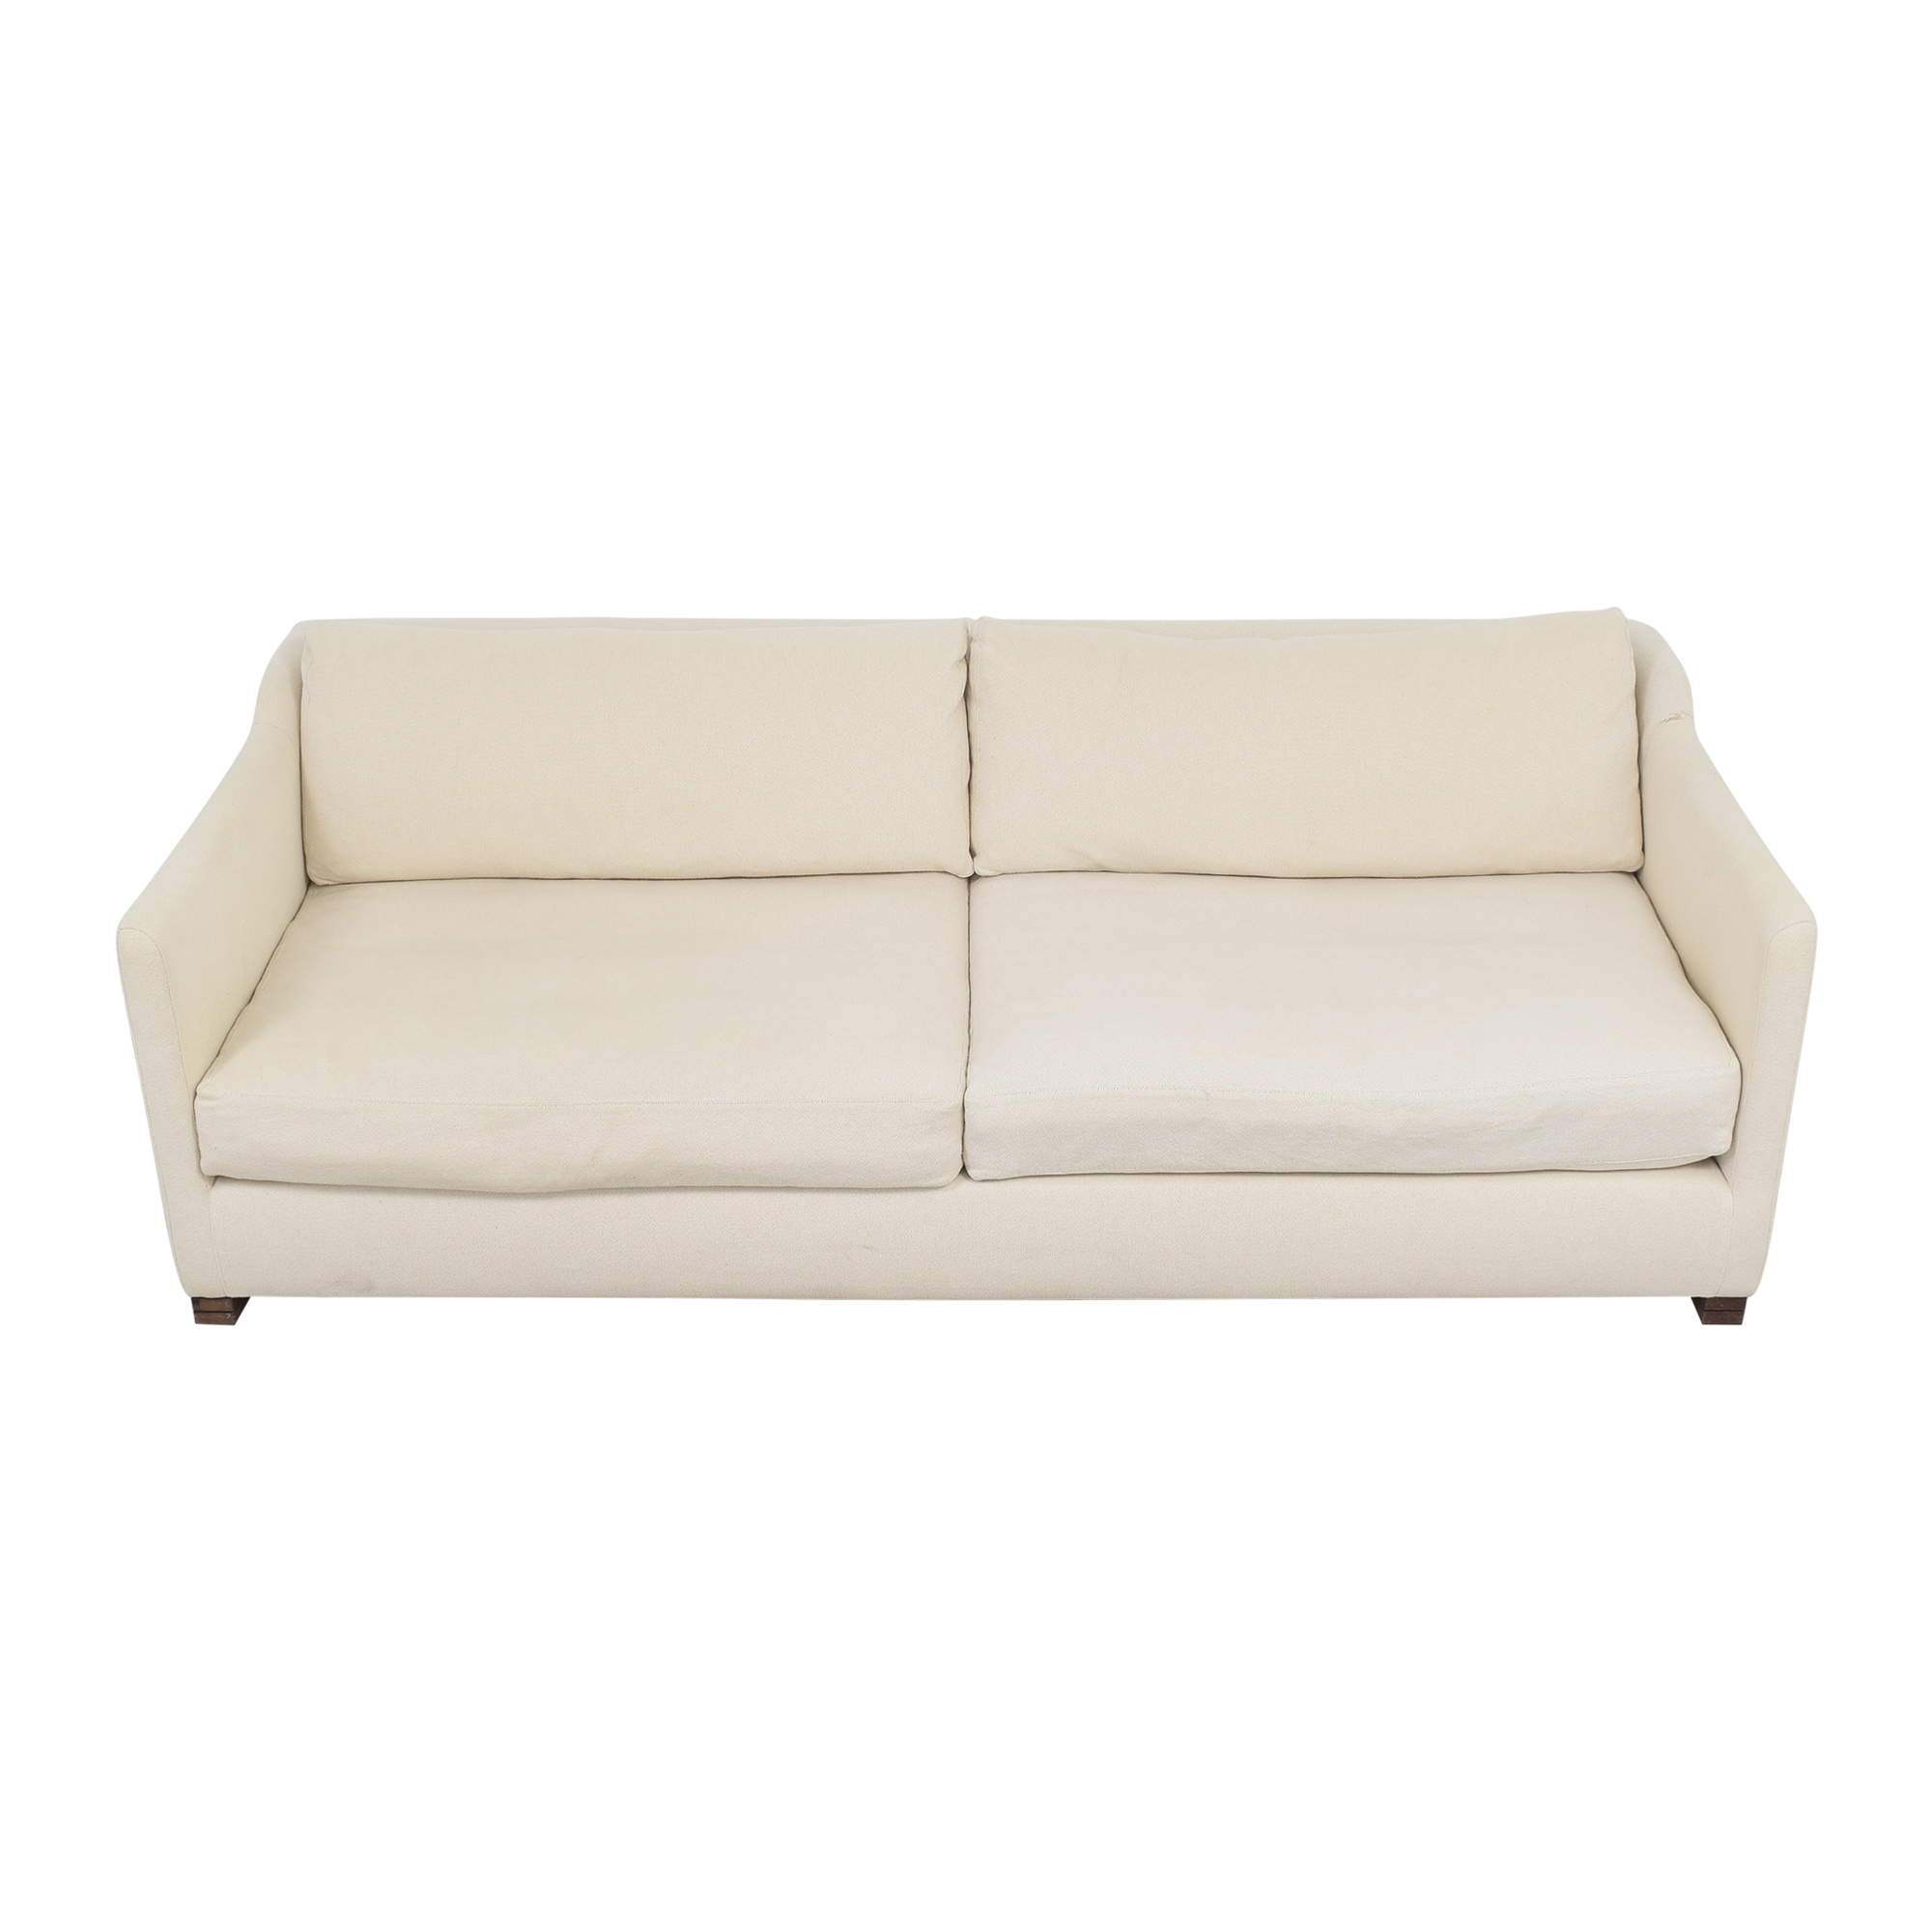 Cisco Brothers Dexter Wide Sofa sale